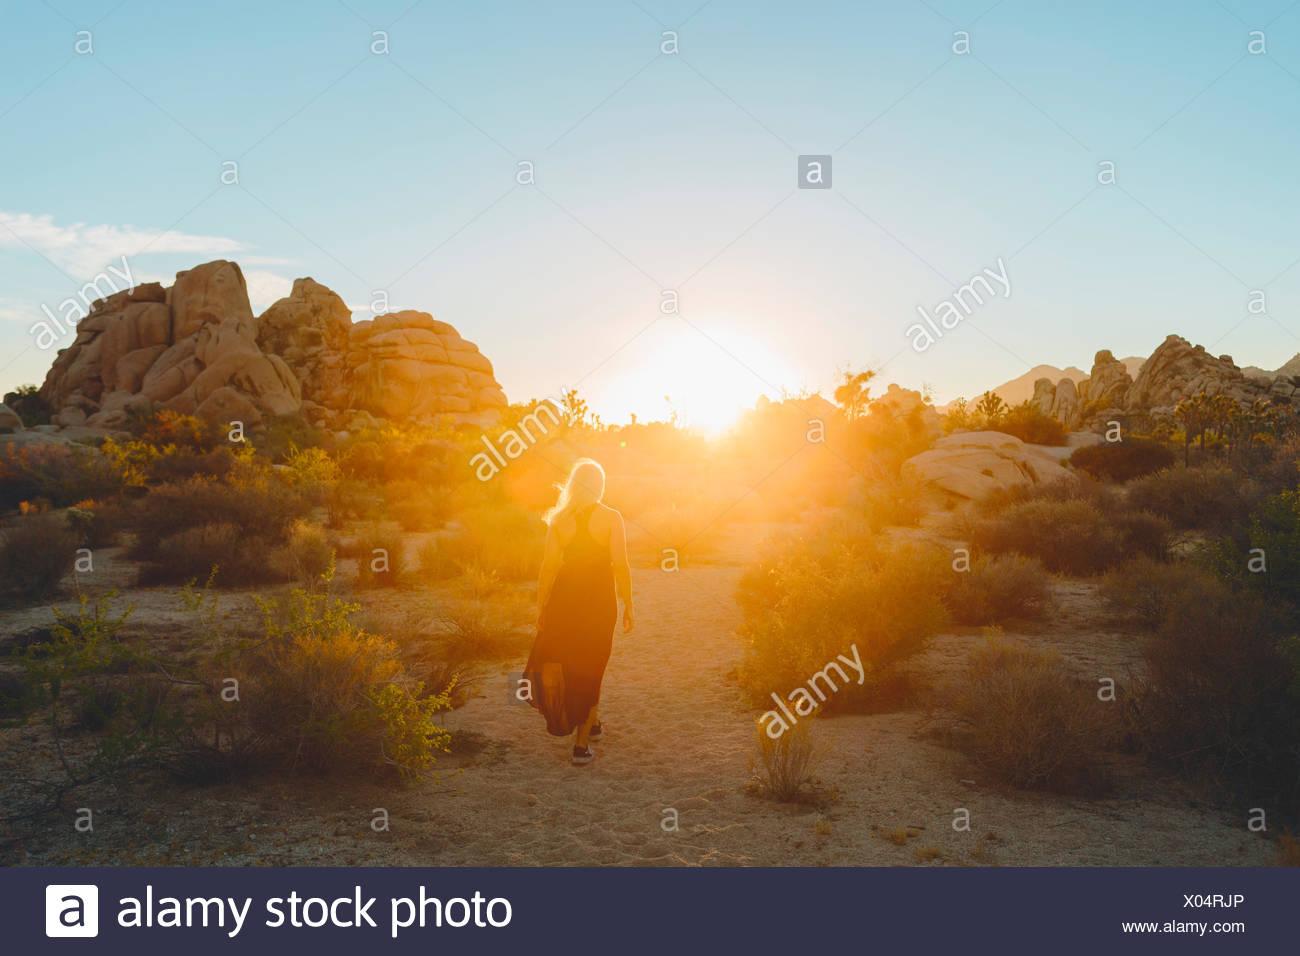 USA, California, Joshua Tree National Park, Woman wearing dress hiking at sunset - Stock Image